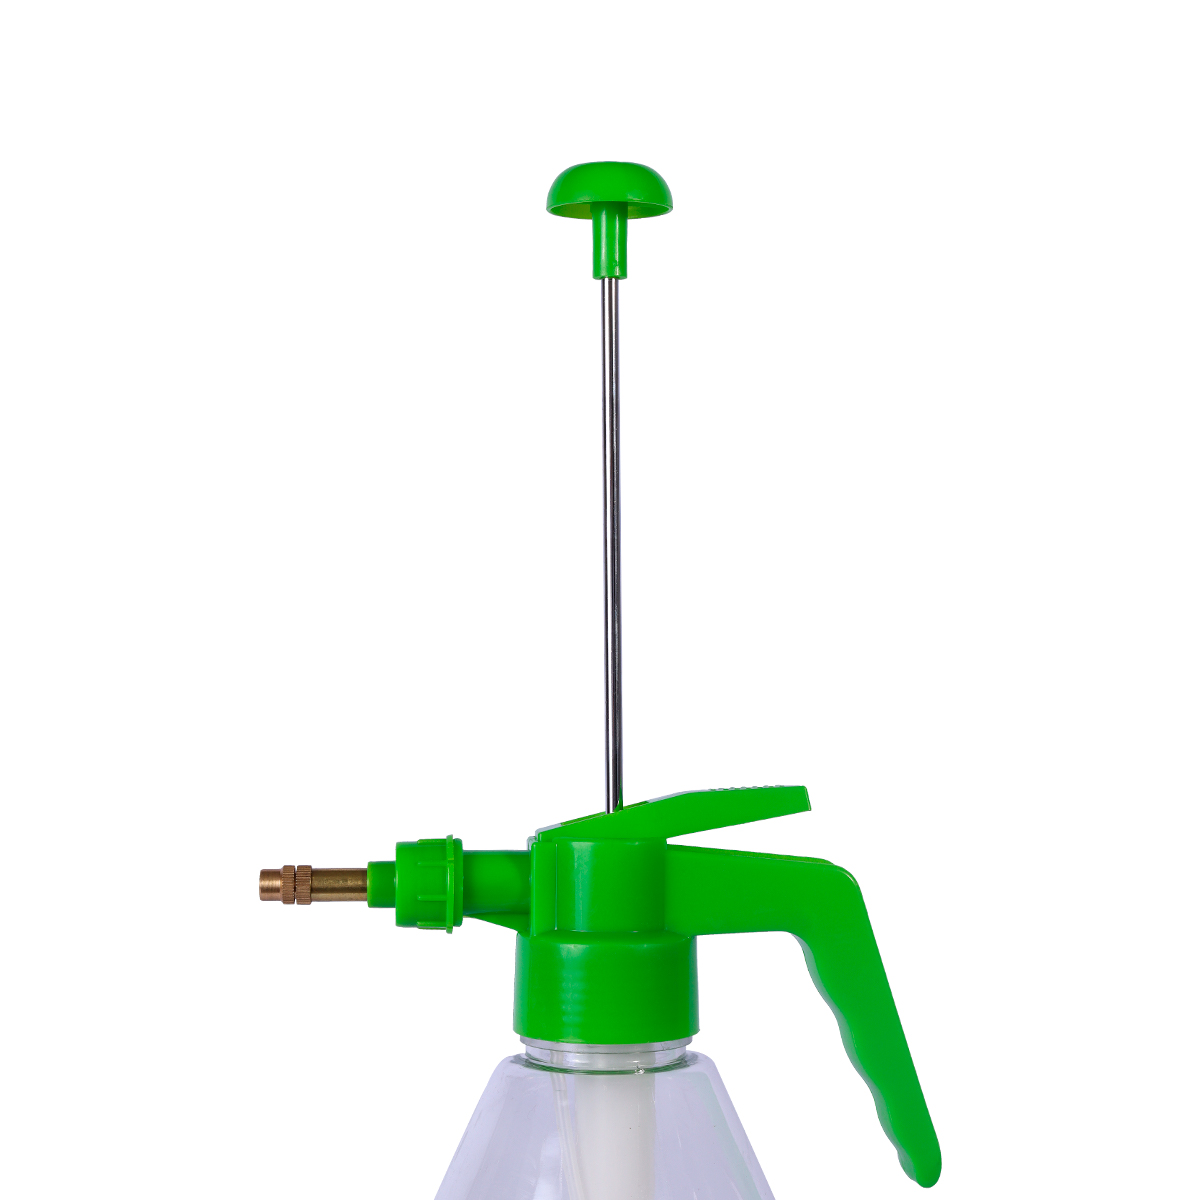 Kit De Limpeza 1 Pulverizador 1,5 Litros + 1 Bactericida 1 Litros